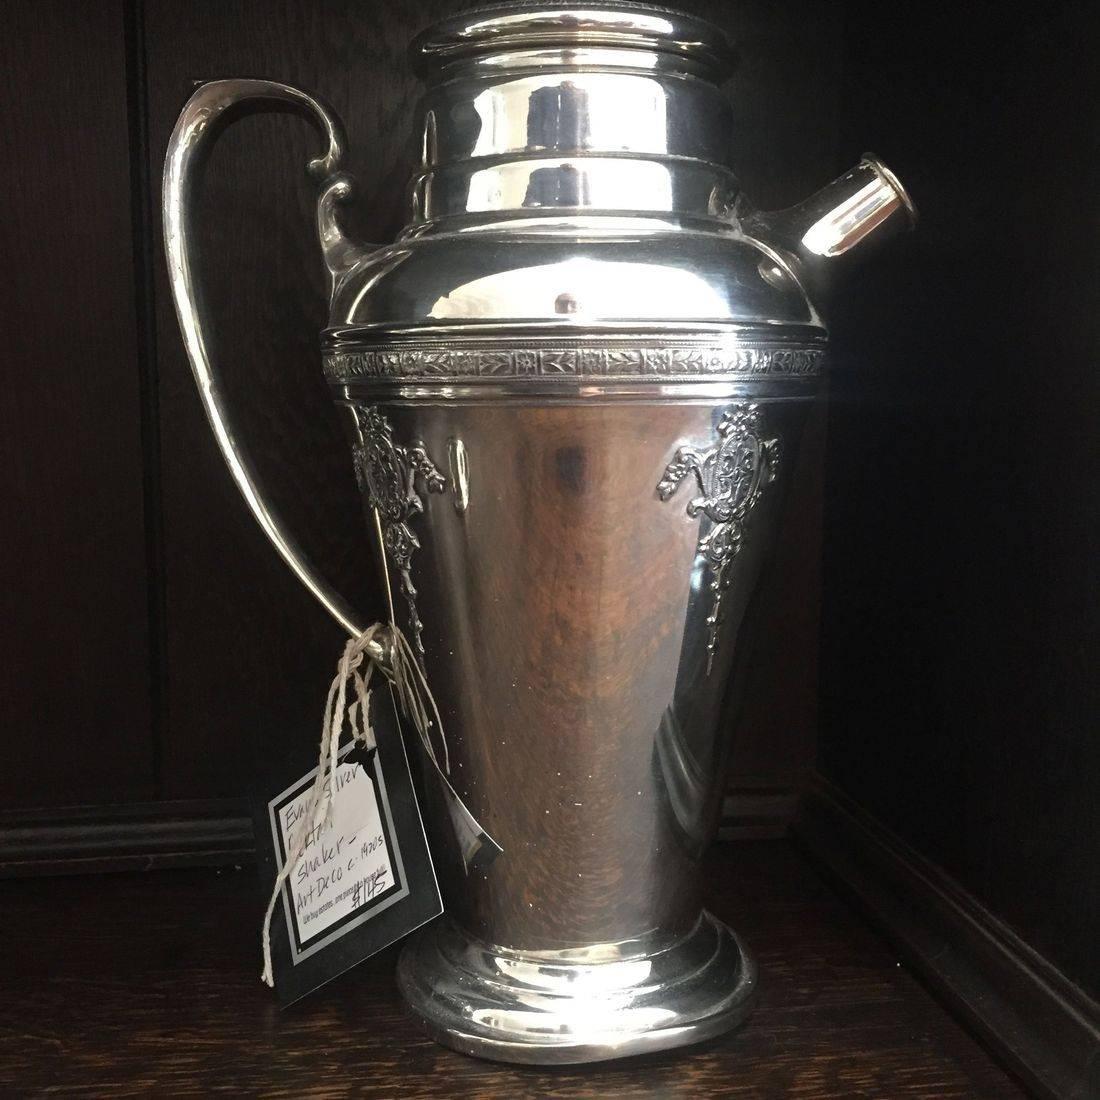 A metal pitcher